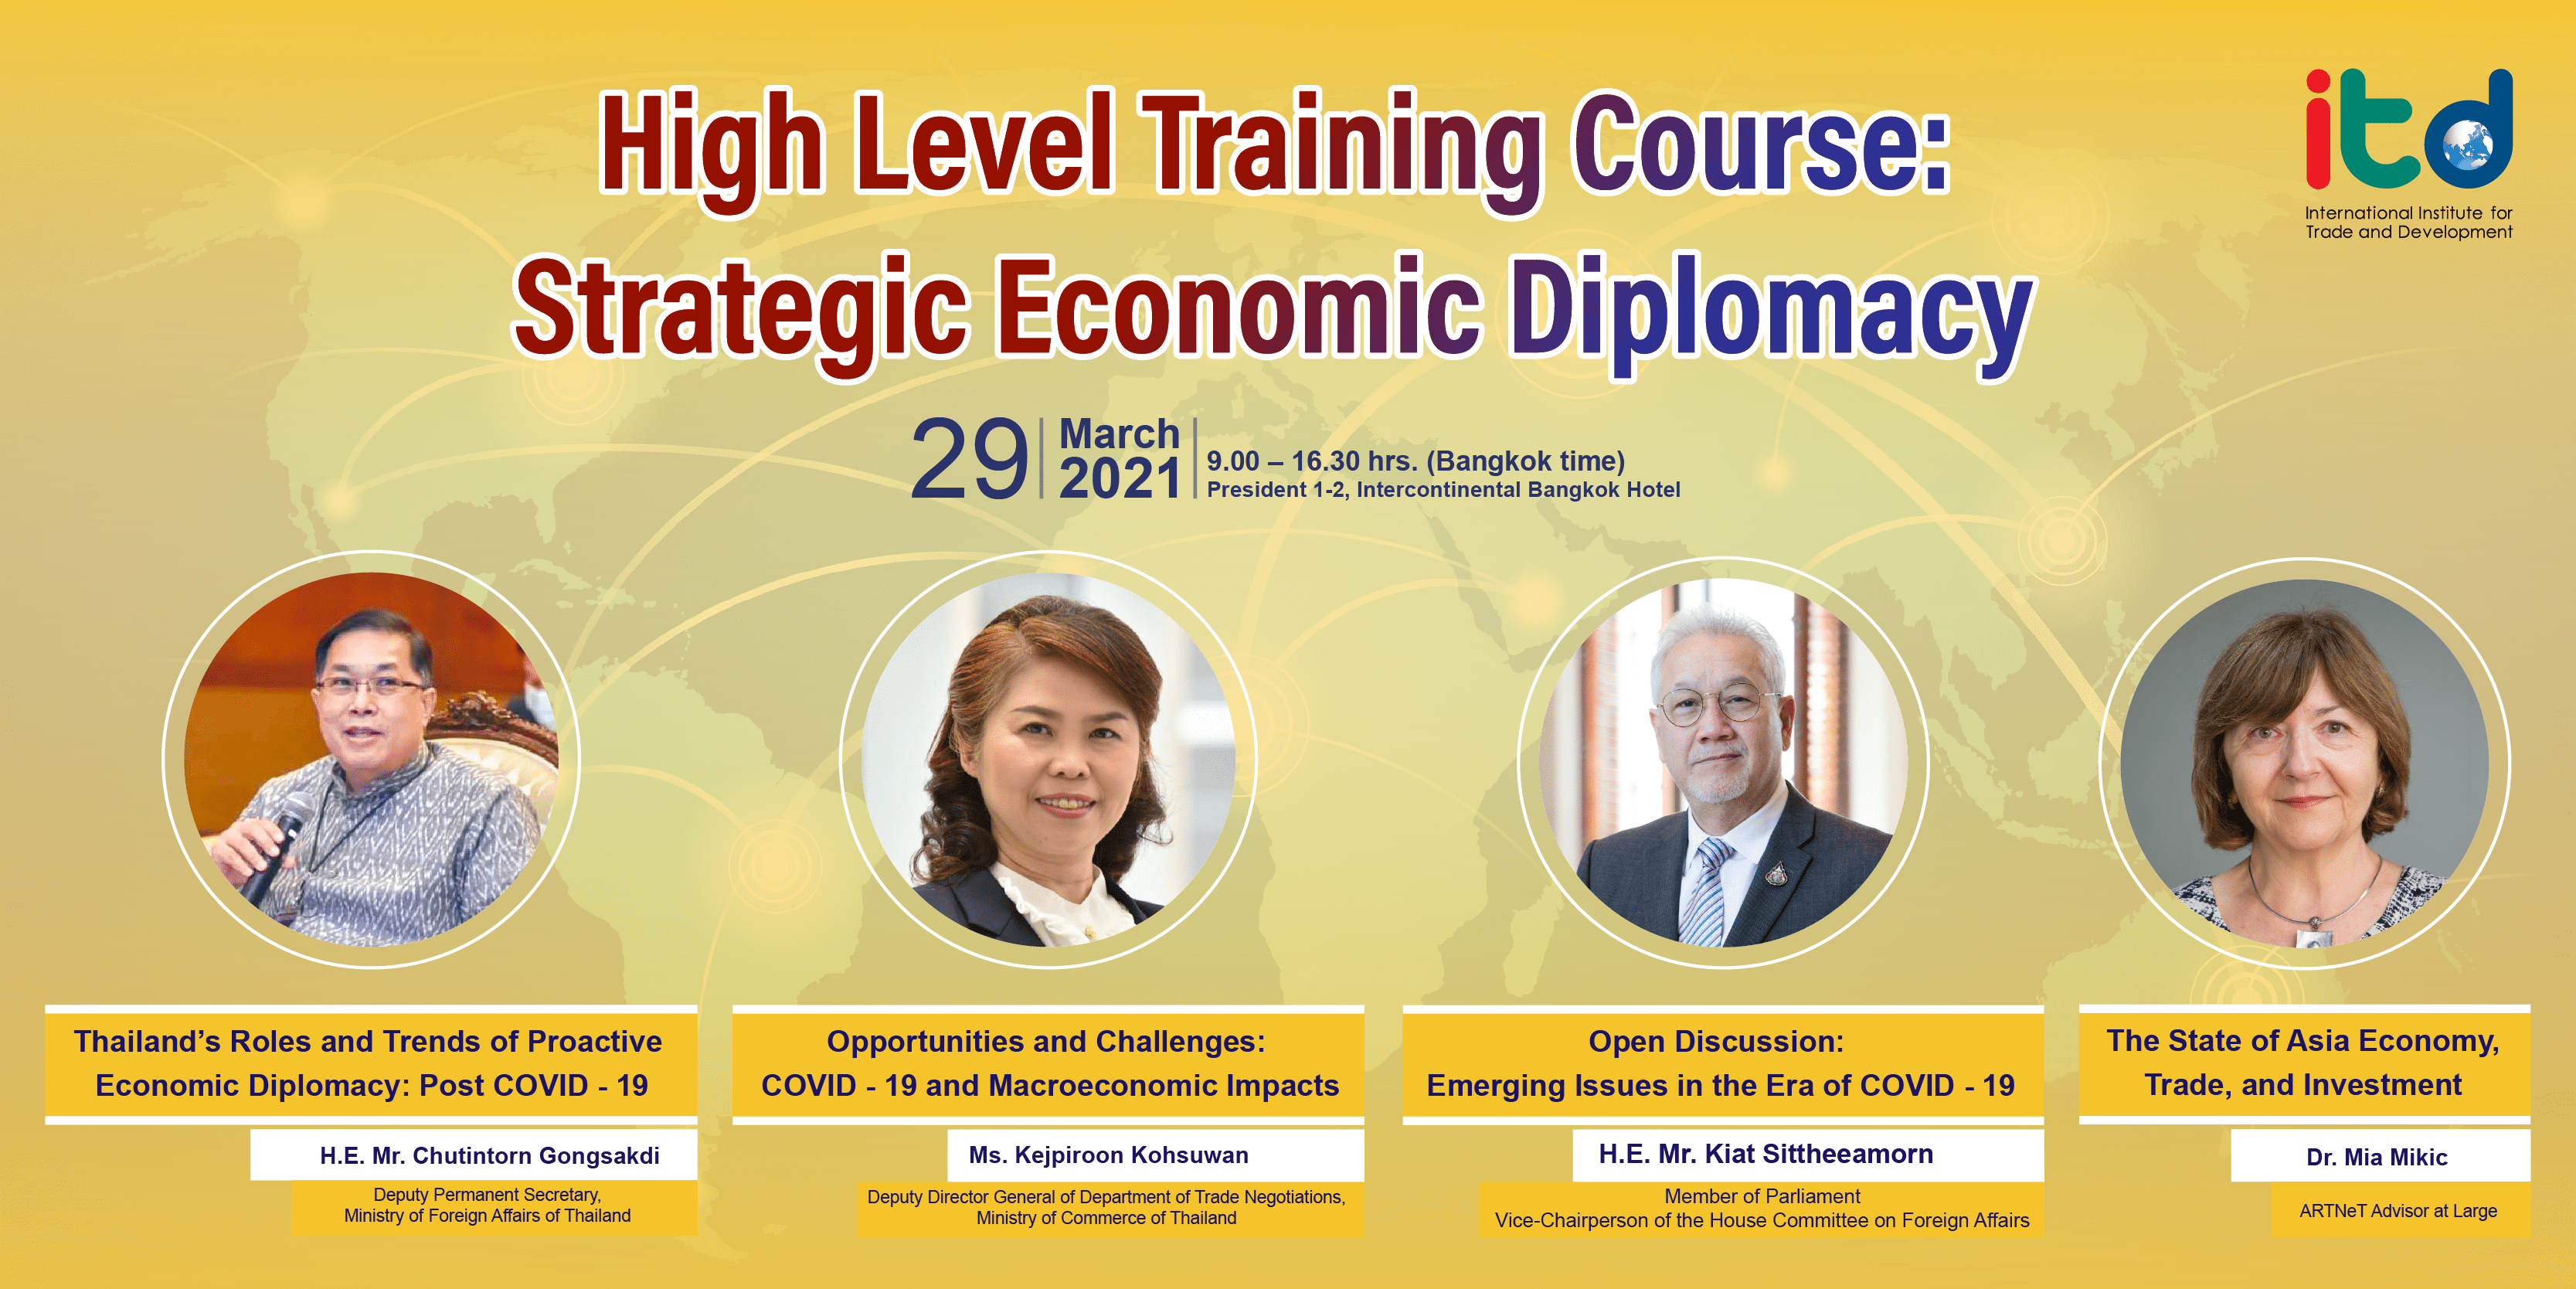 High Level Training Course: Strategic Economic Diplomacy